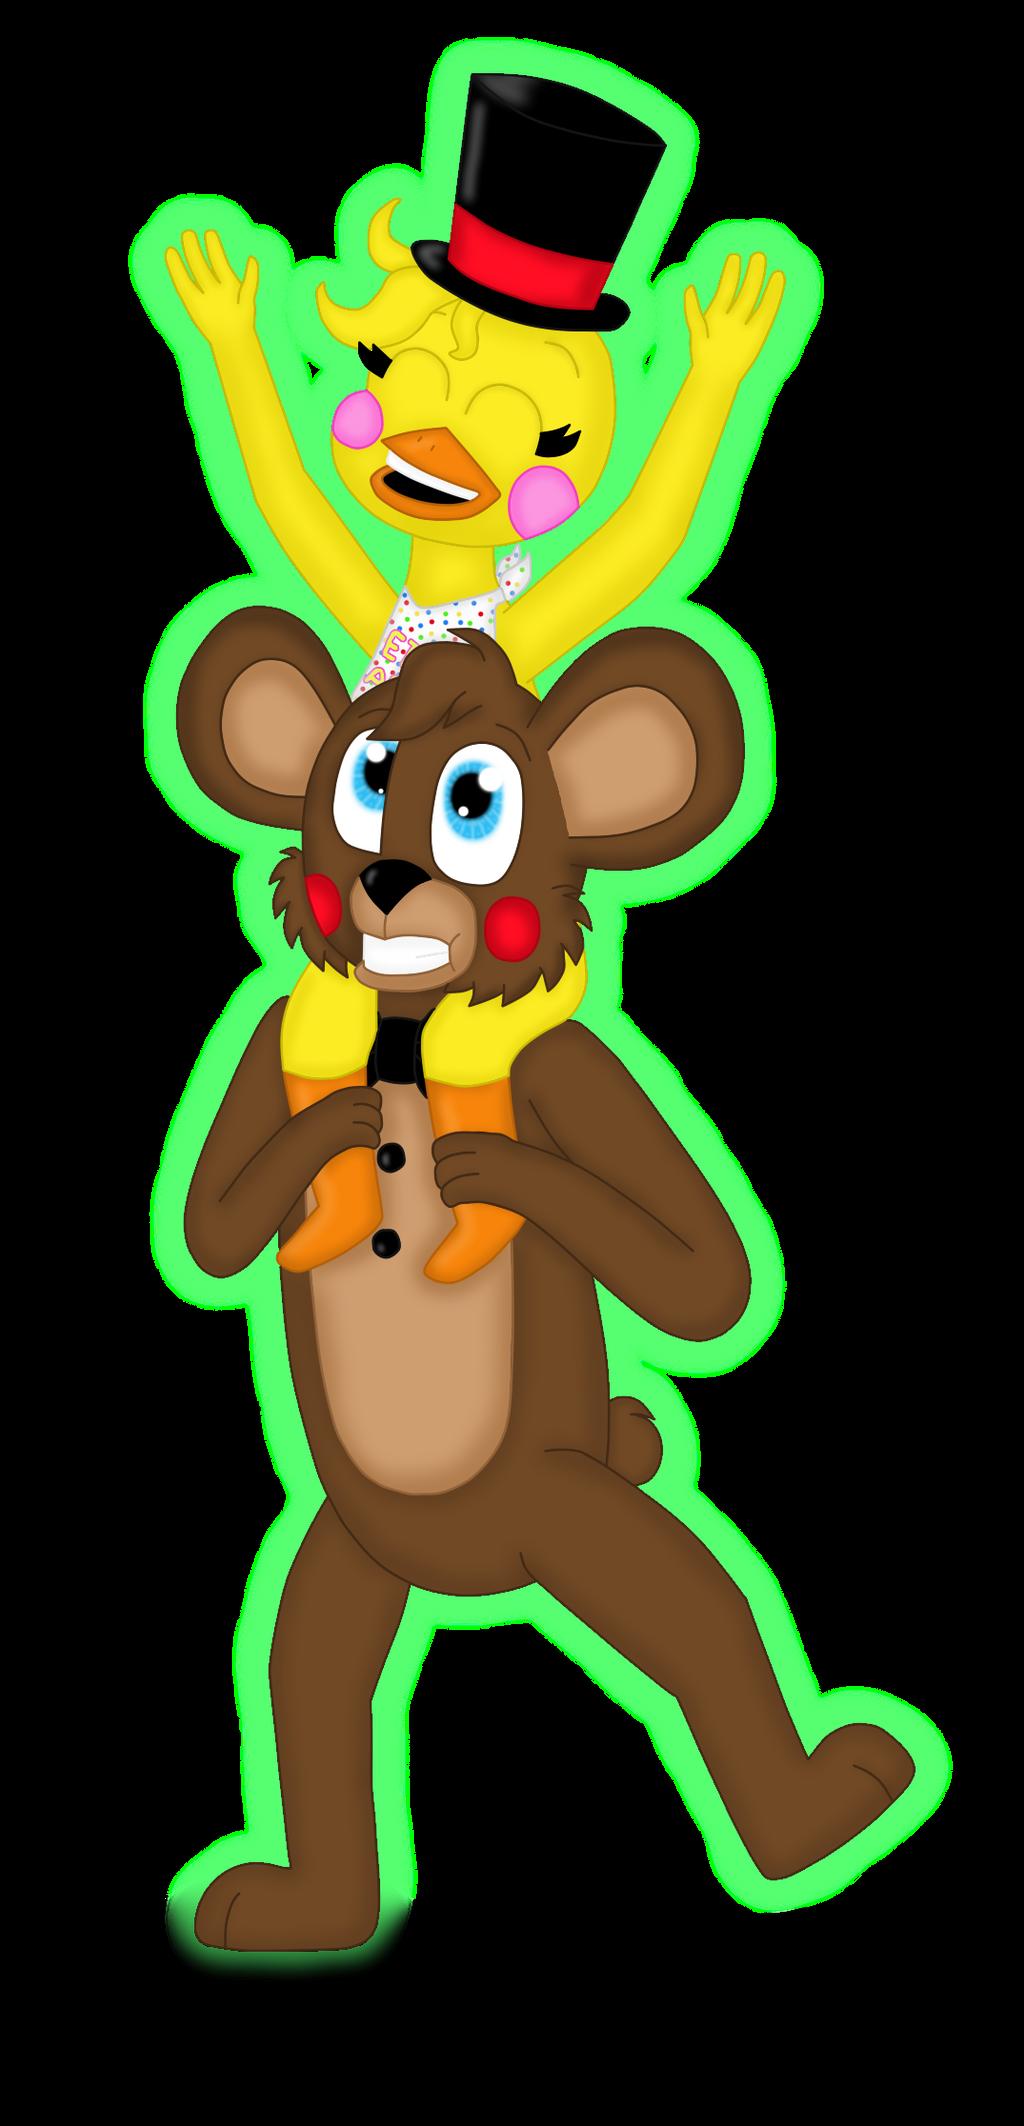 Baby Freddy Toys : Go toy freddy baby freddica by thetigressflavy